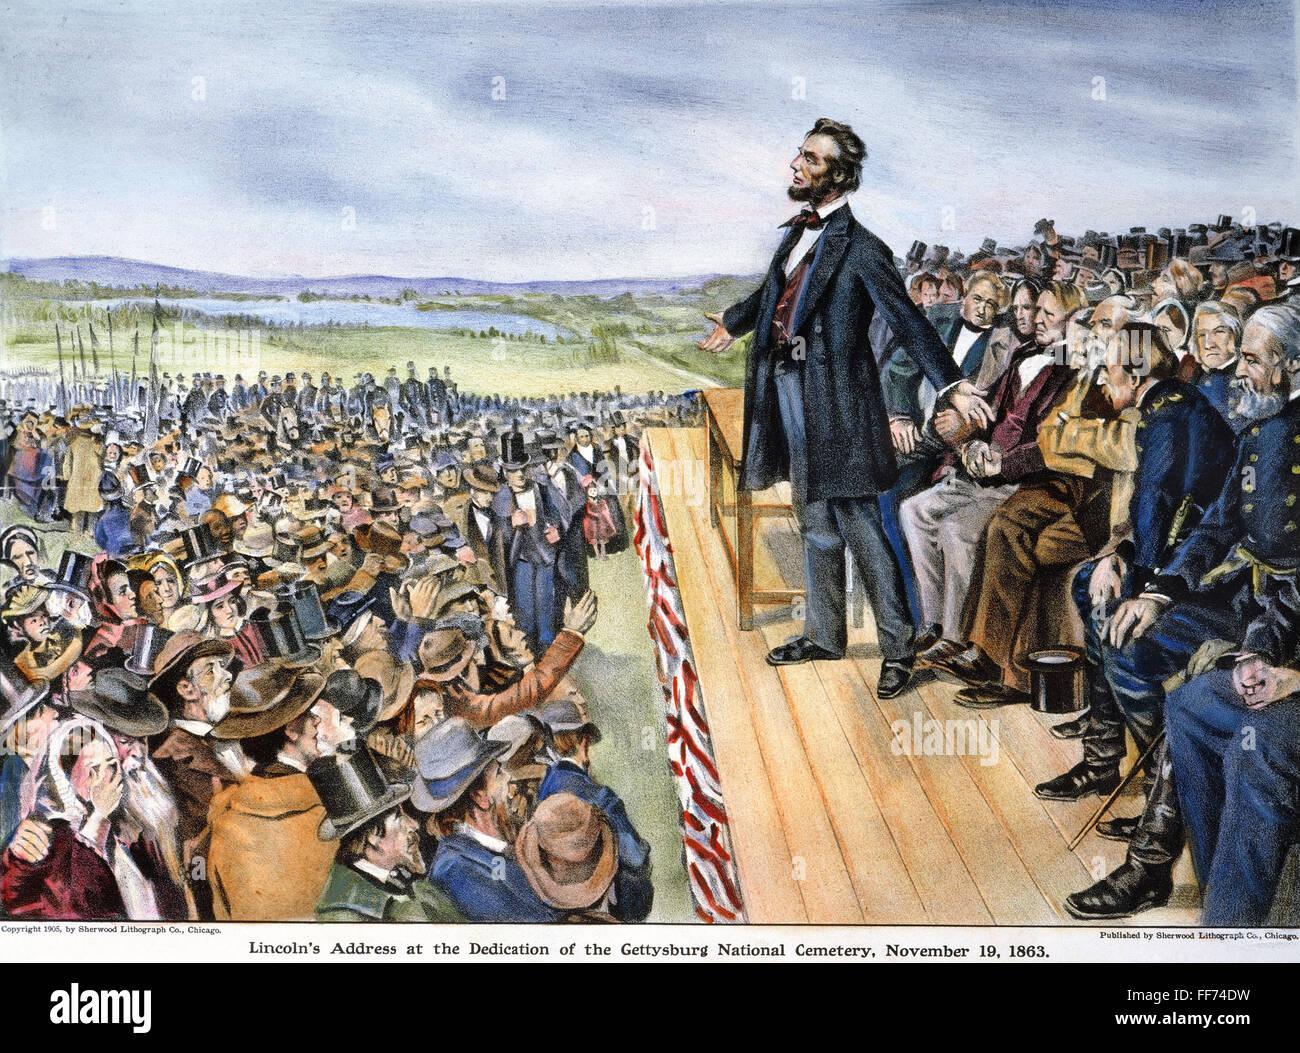 president lincolns speech - 512×512